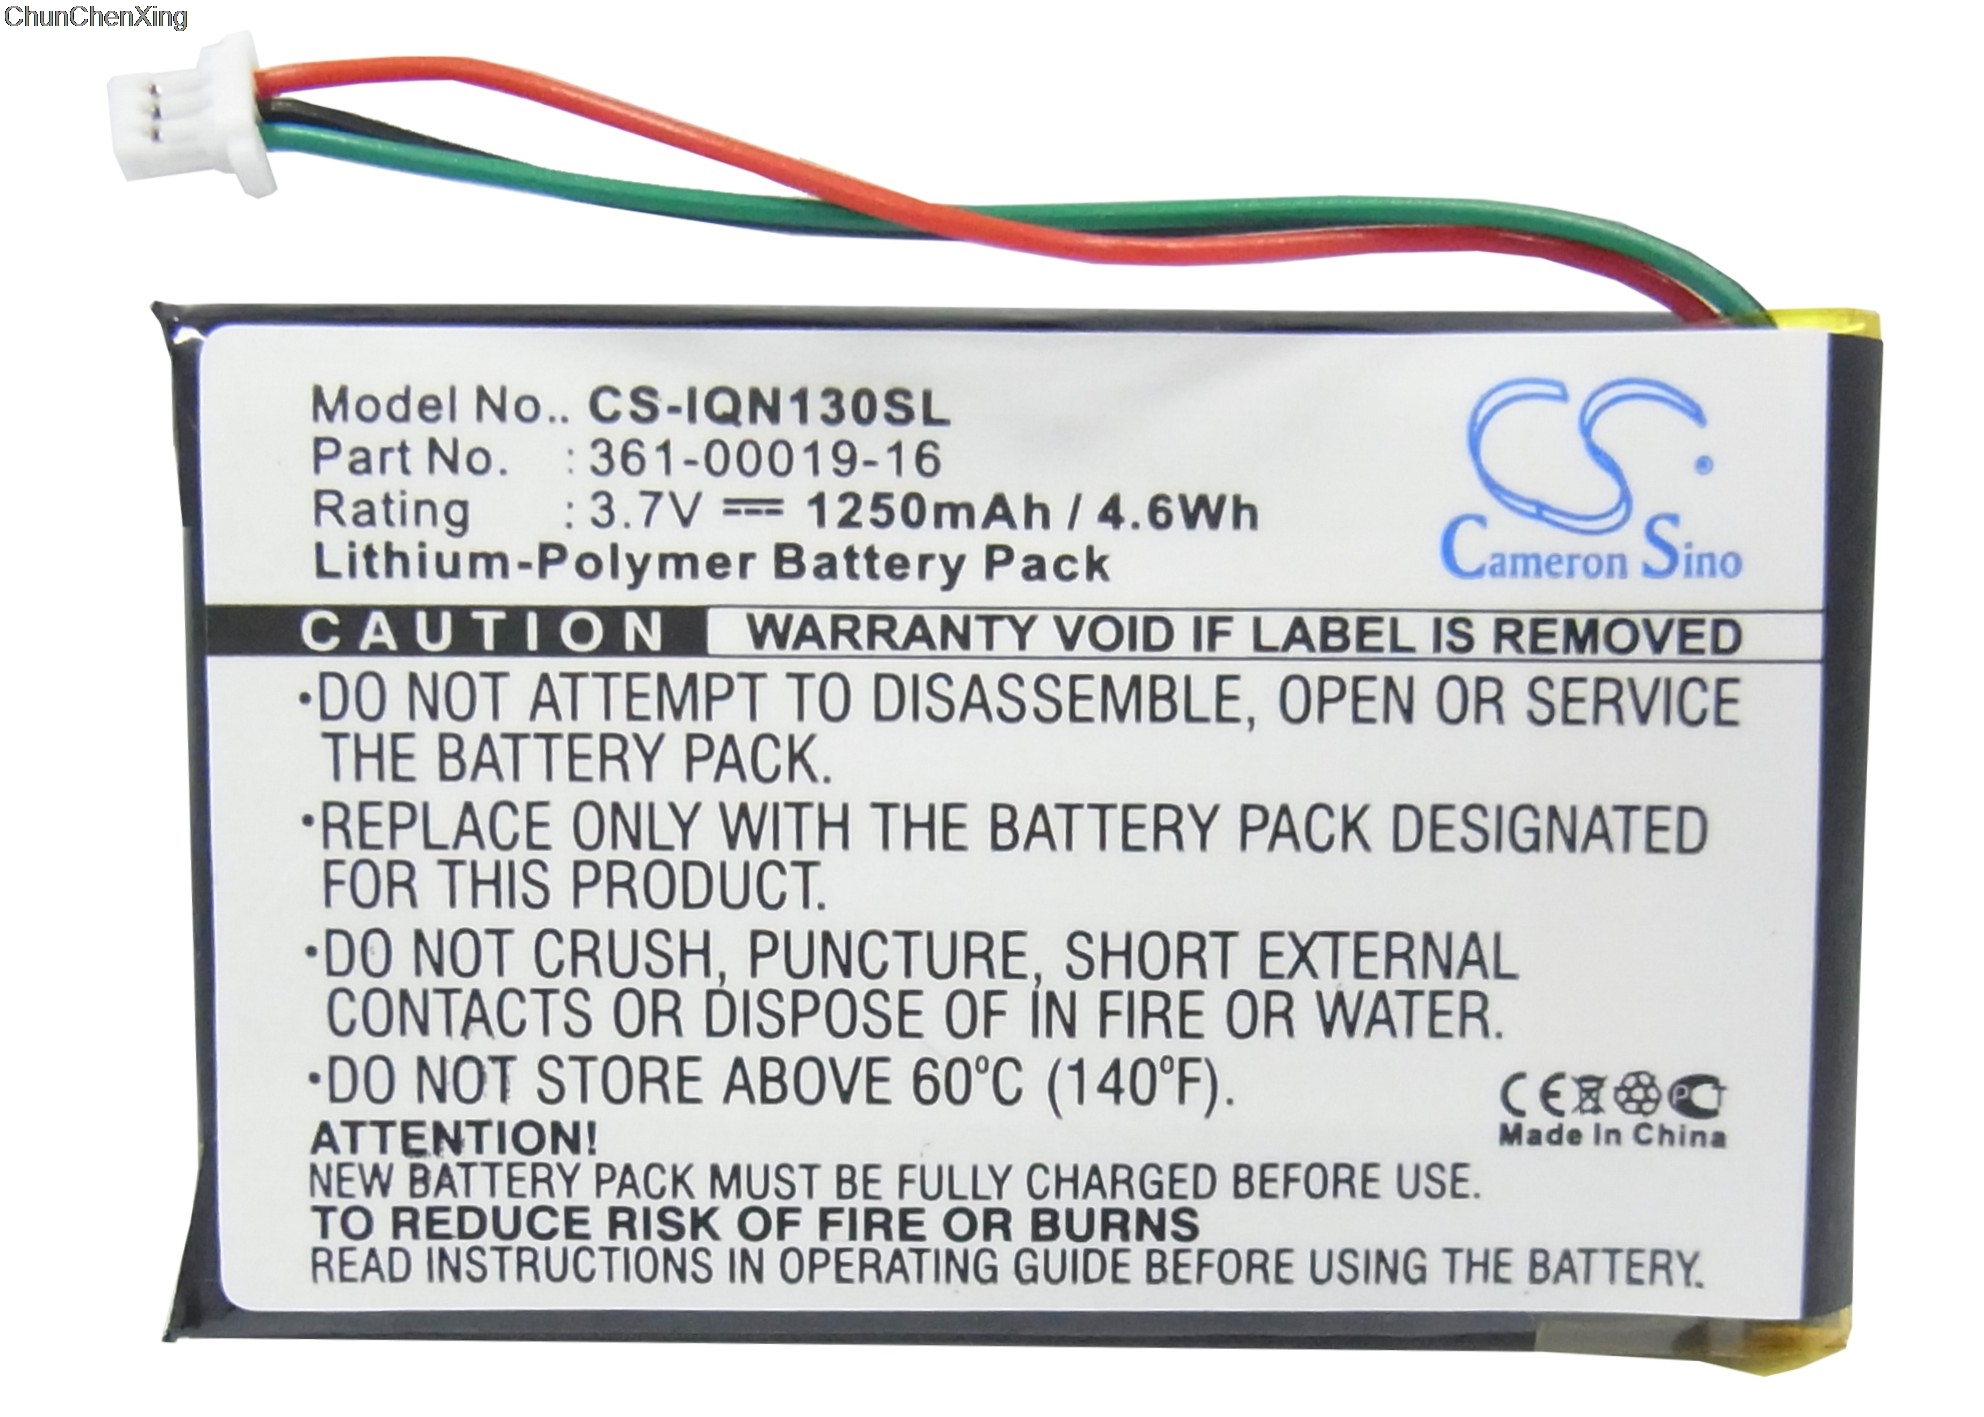 Cameron Sino 1250 mAh Bateria 361-00019-16 para Garmin Nuvi 1300, 1340 T  Pro, 1350, 1350 T, 1370, 1370 T, 1375 T, 1390, 1390 T, 1490